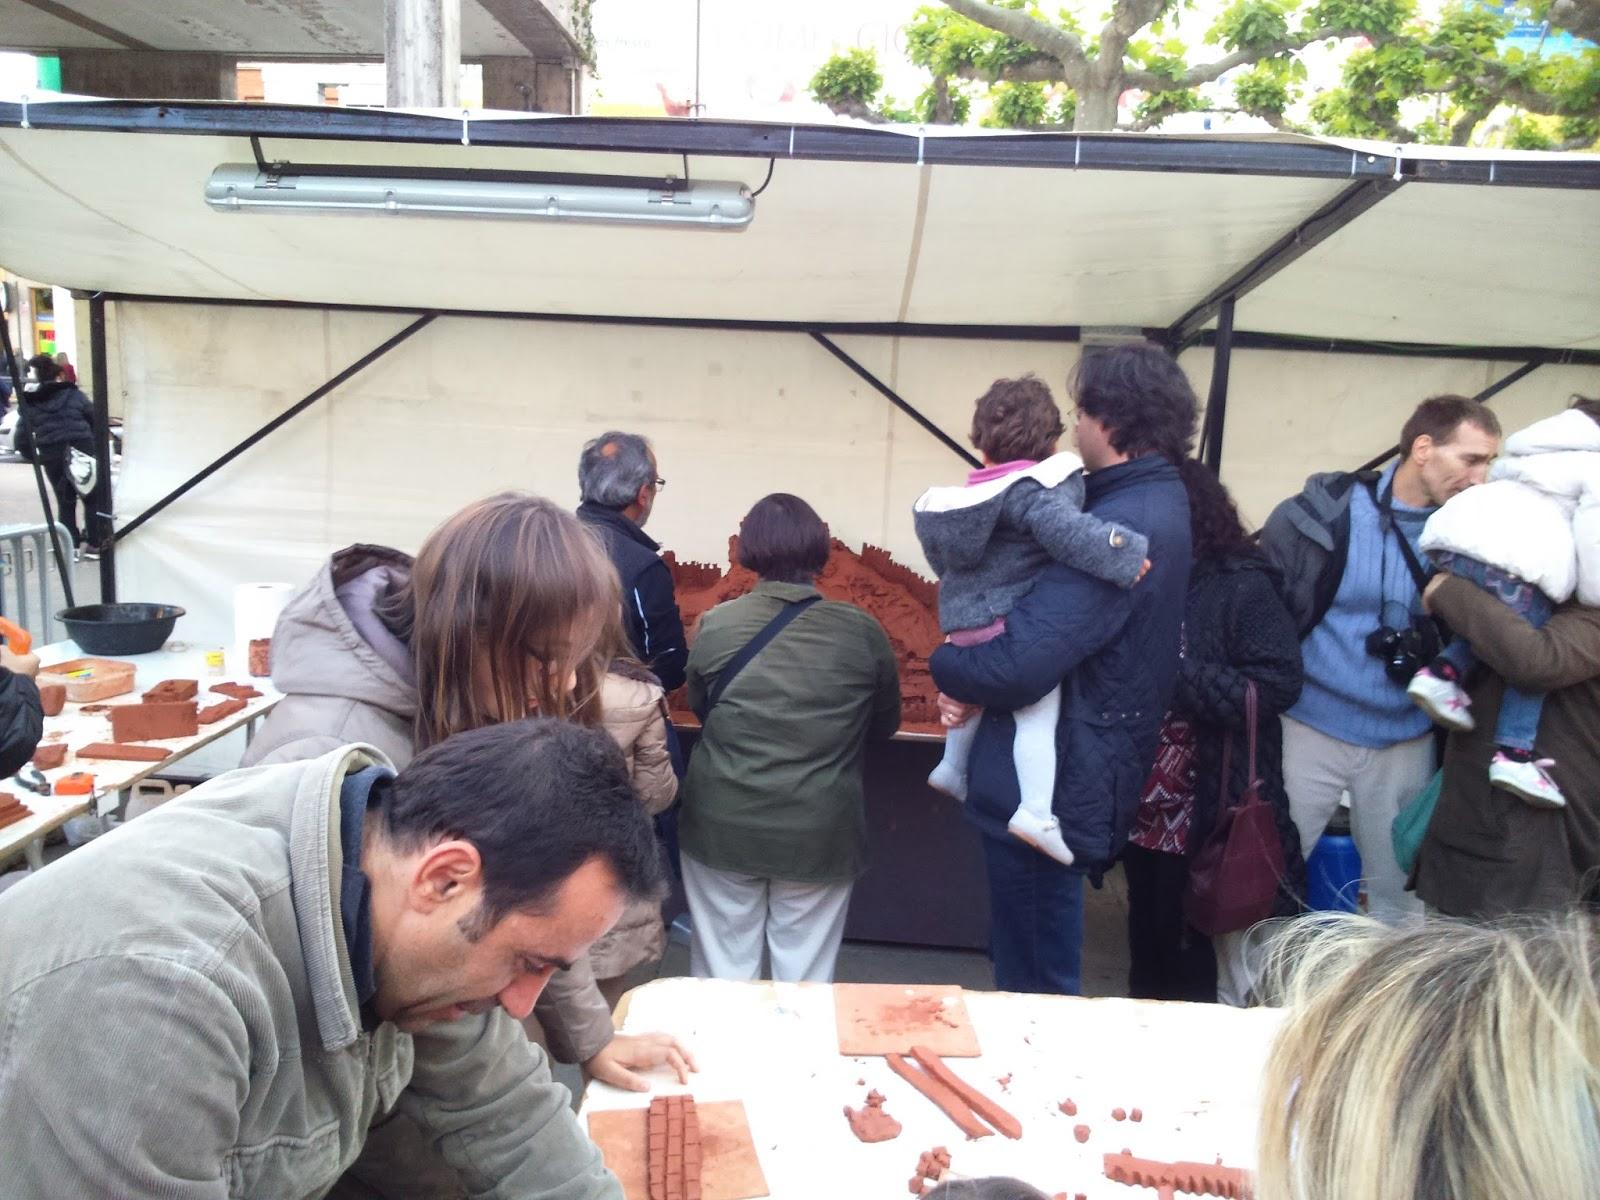 Colectivo de artesanos de burgos coarte mayo 2015 for Ceramicas burgos